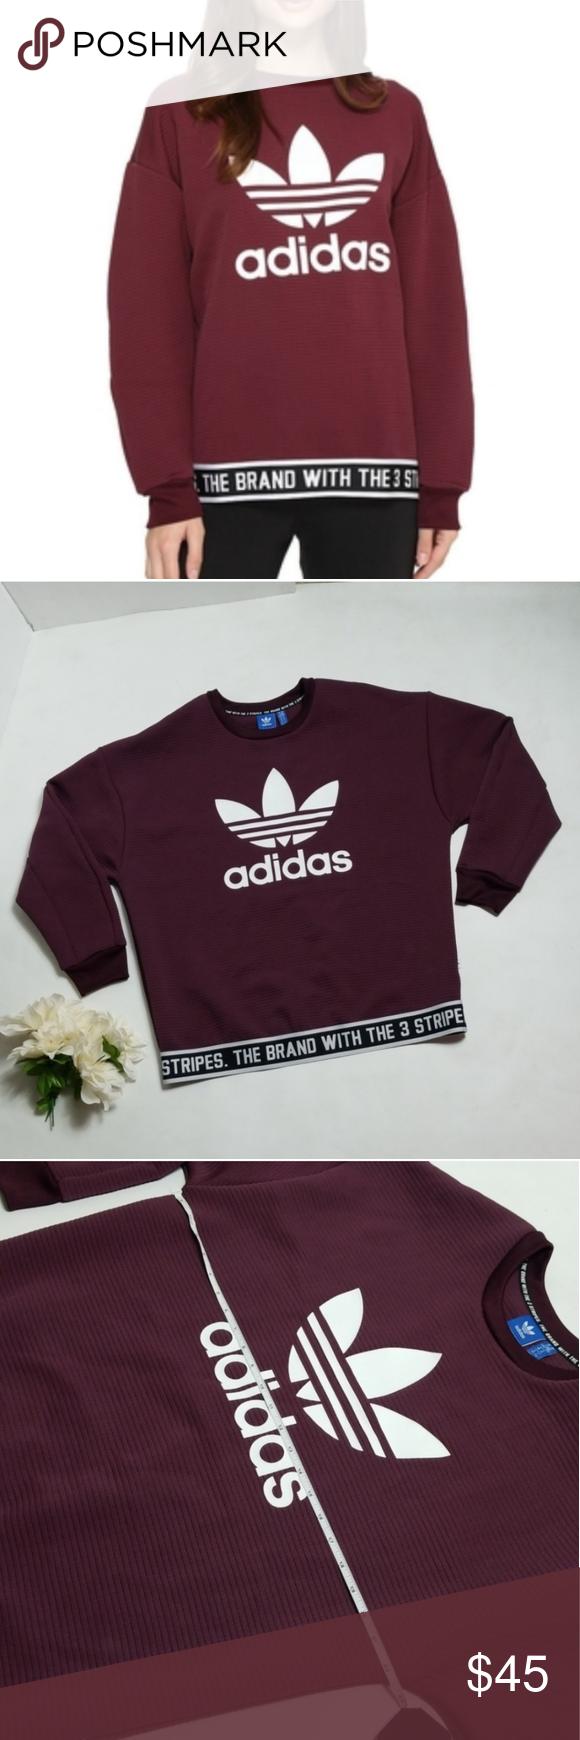 Adidas originals M maroon burgundy trefoil logo ADIDAS Size